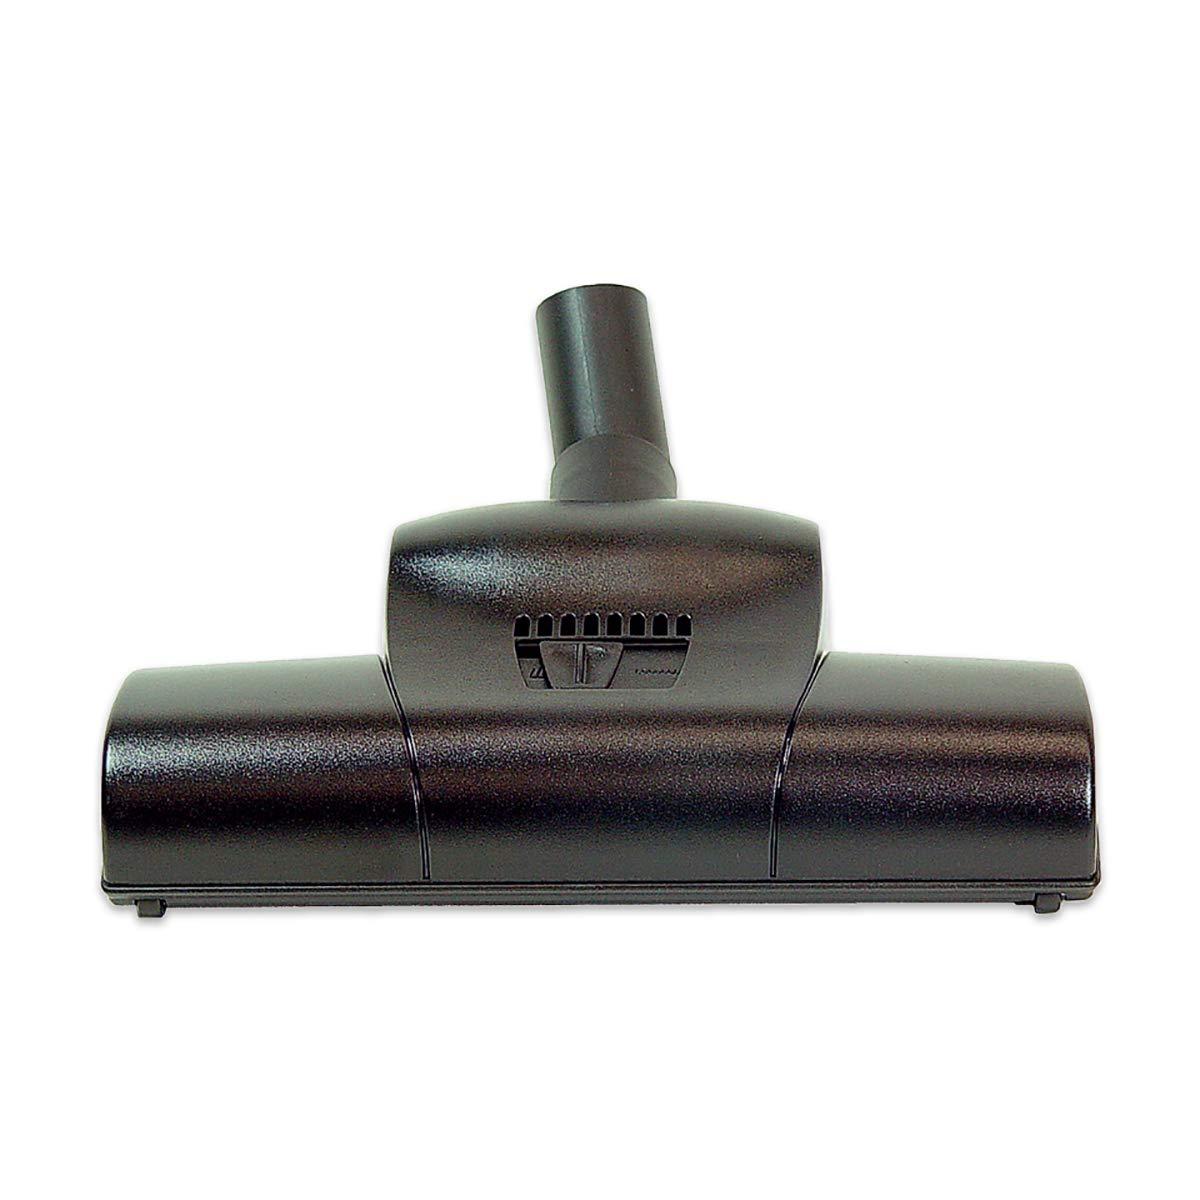 ProTeam 100117 11-inch Turbo Brush Carpet Floor Tool, Vacuum Floor Brush for Medium- to High-Pile Carpets and Entry Mats